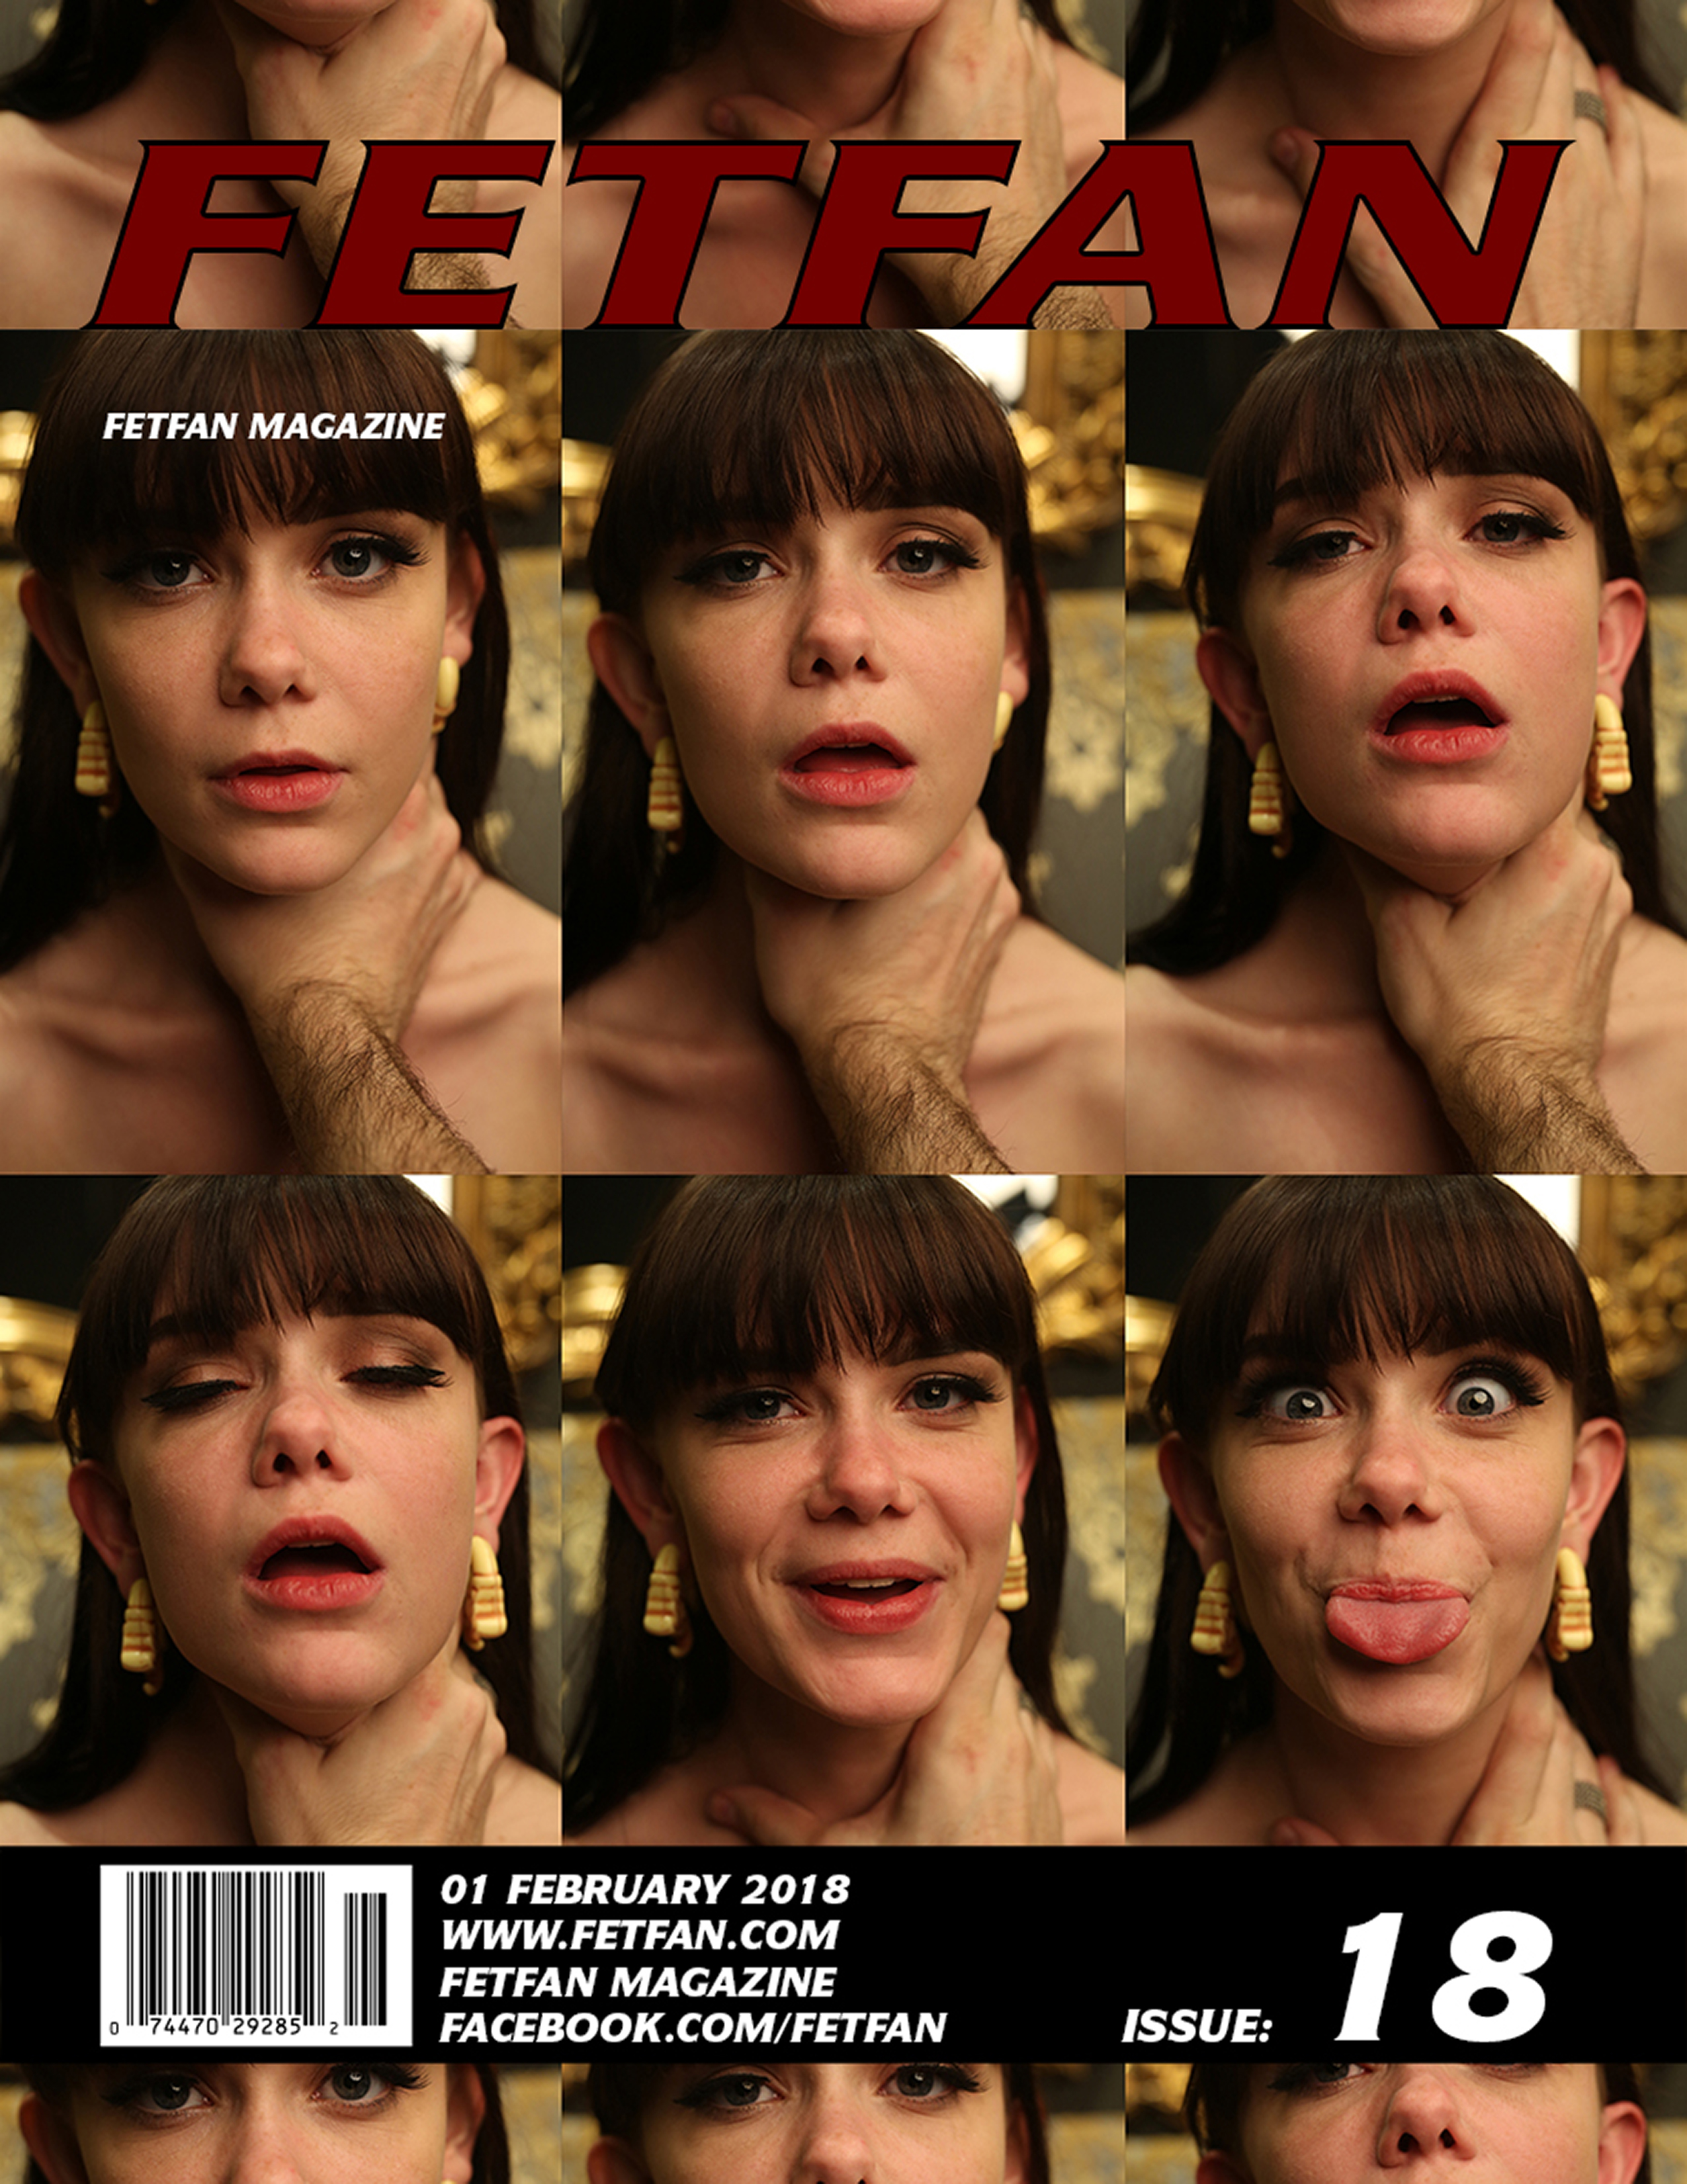 FETFAN Magazine Issue: 18